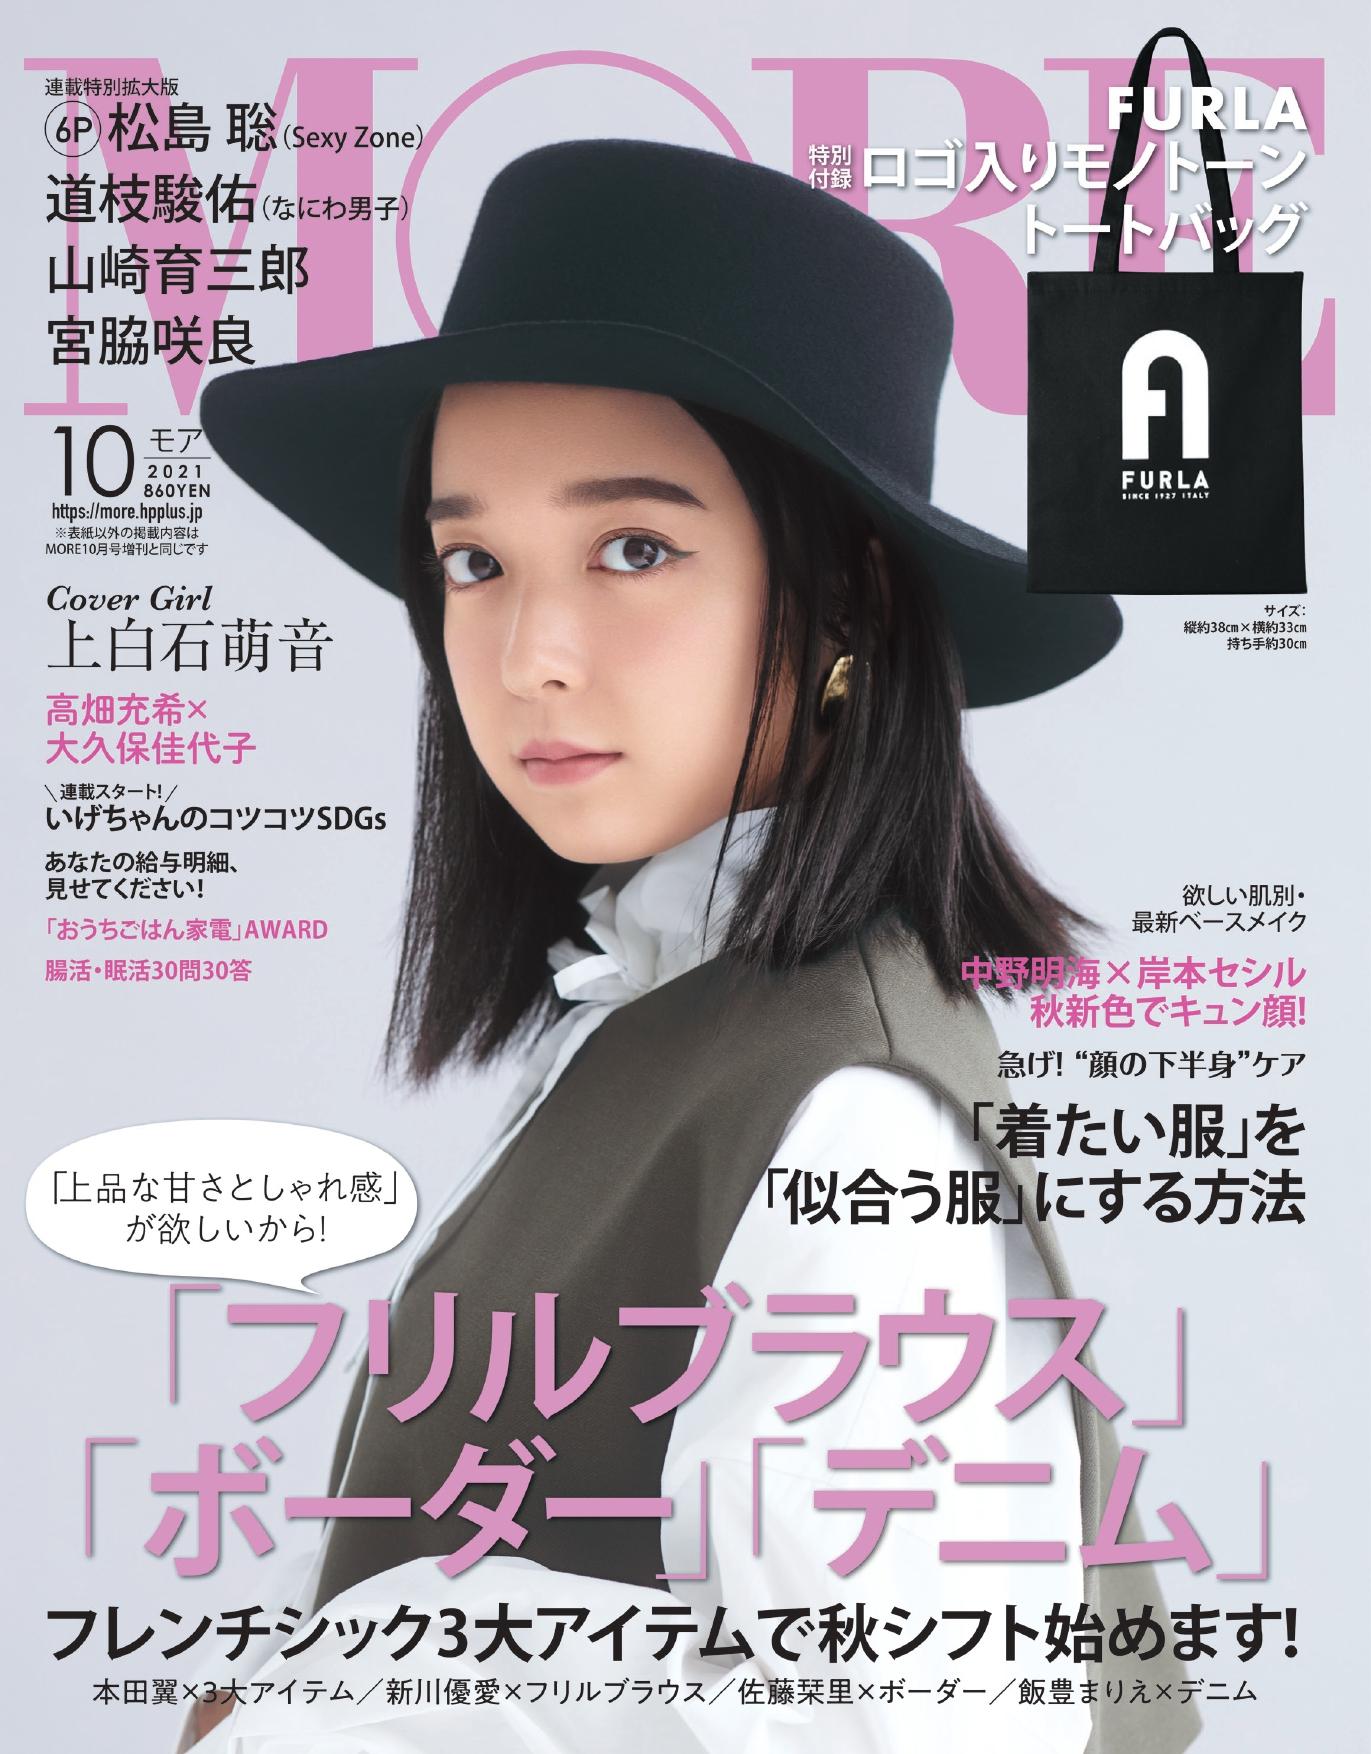 MORE10月号表紙の上白石萌音さん